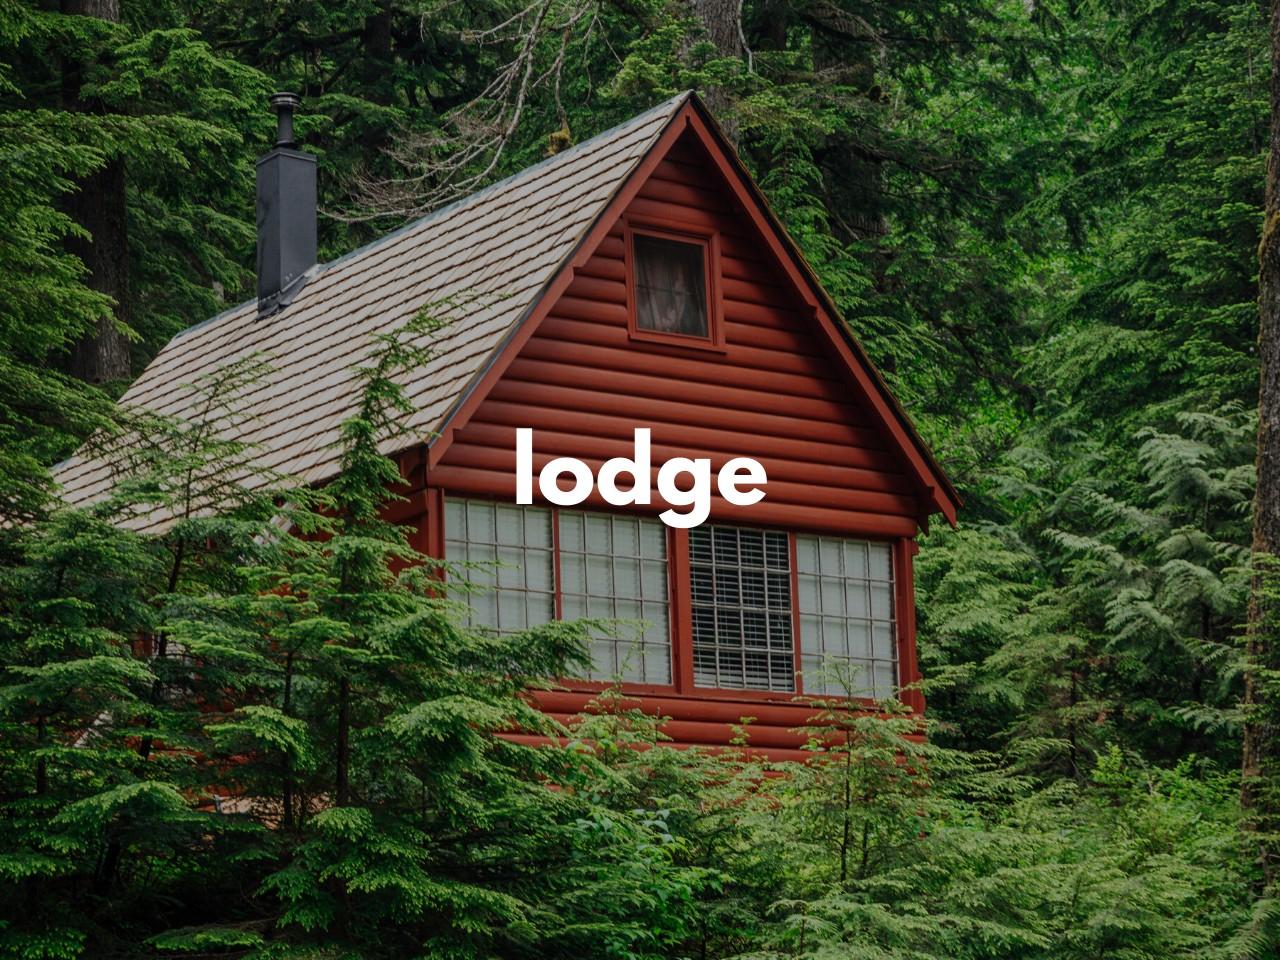 lodge : ロッジ